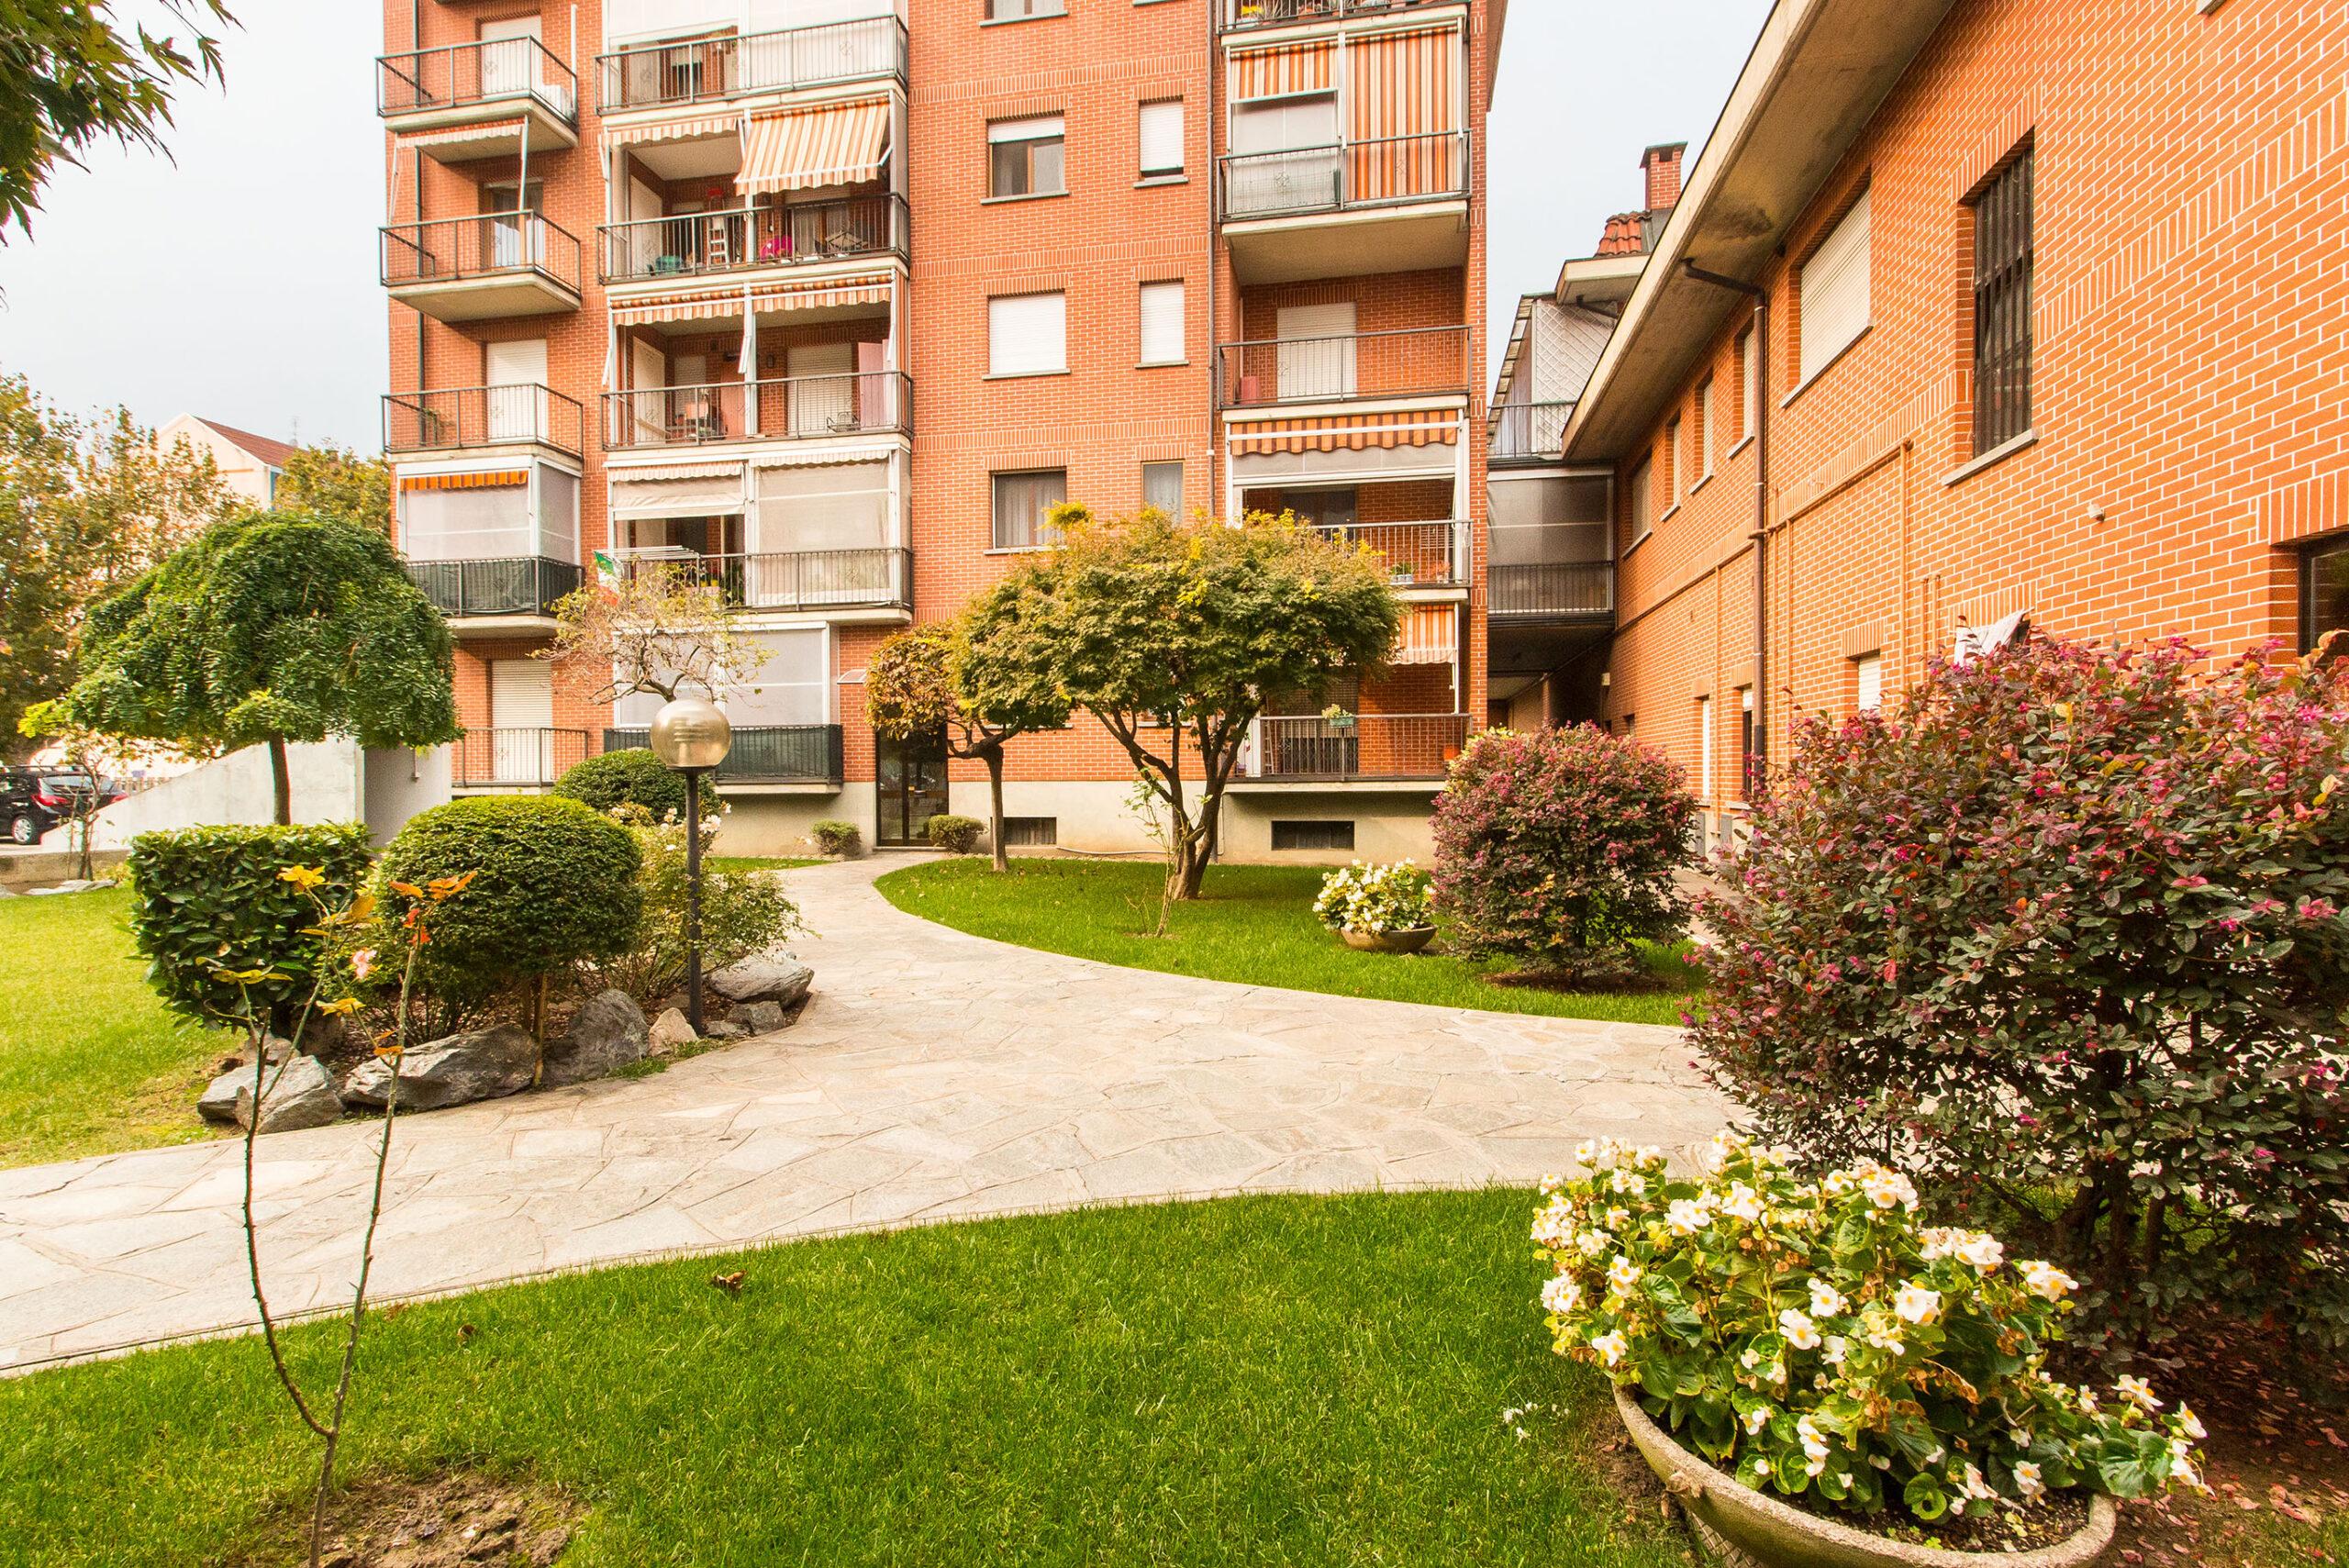 Appartamento bilivello: Via XXV Aprile, 69, Nichelino, Torino